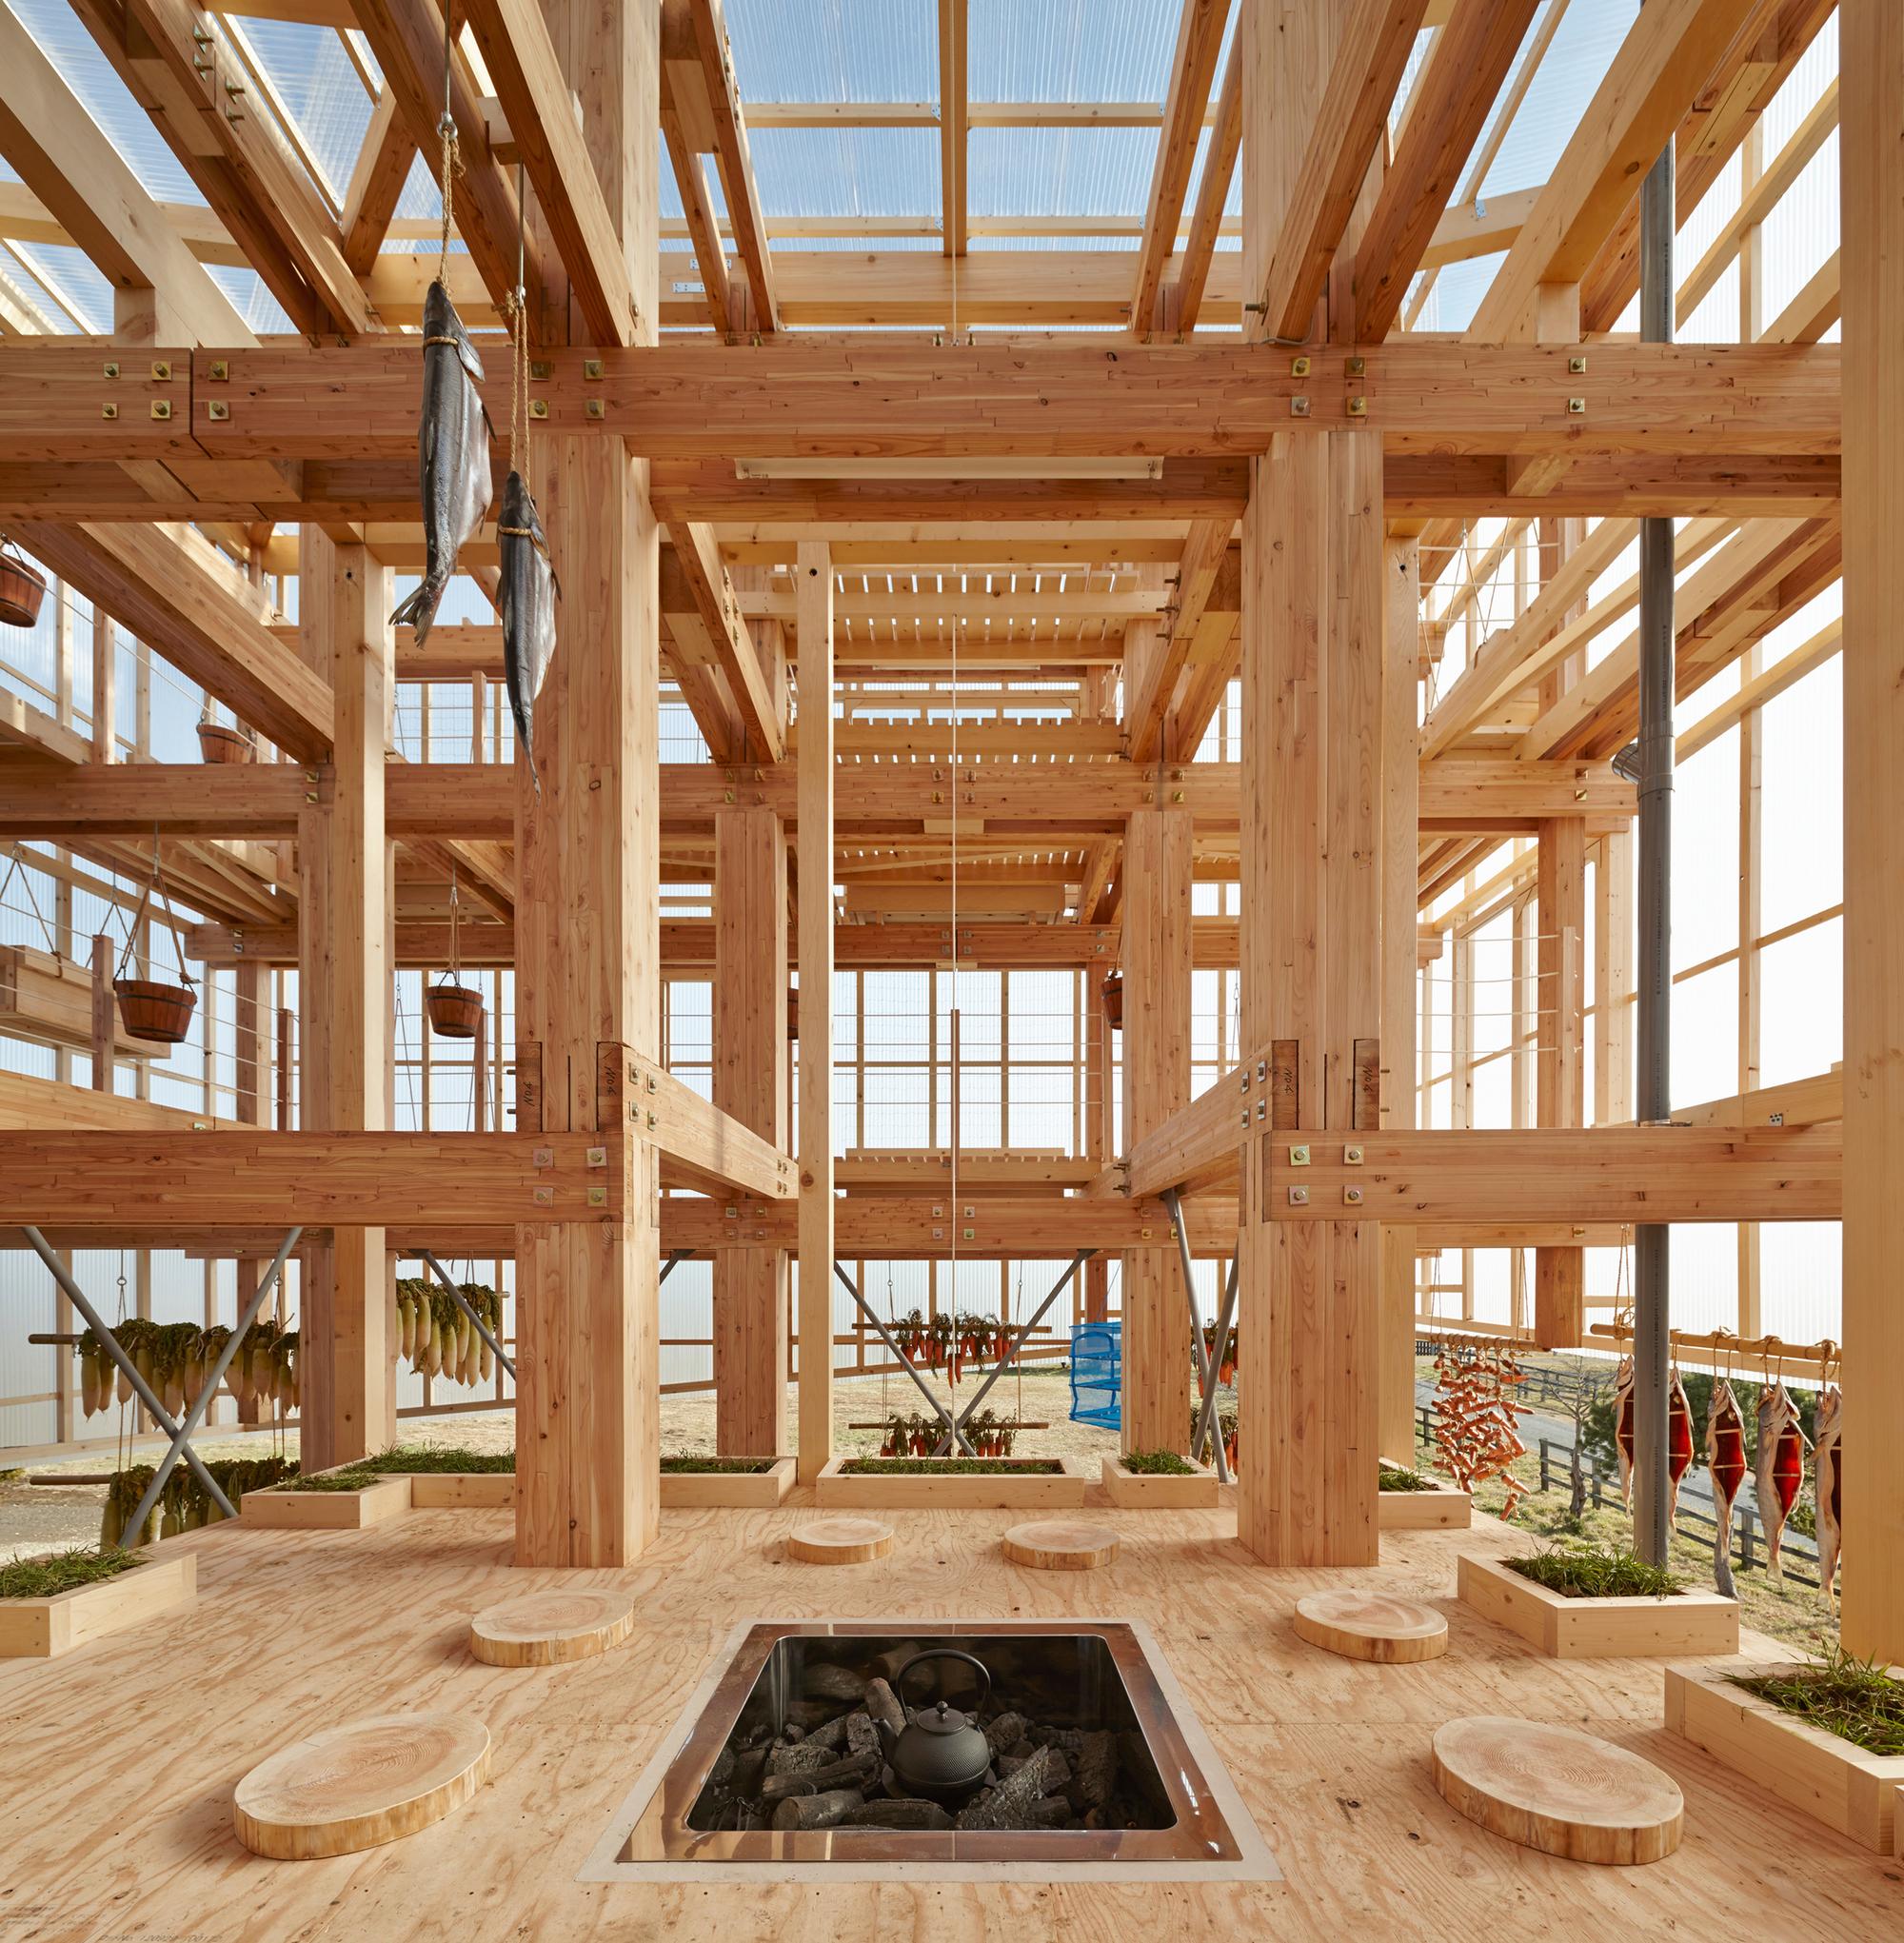 Nest We Grow  / Faculdade de Projeto Ambiental UC Berkeley  + Kengo Kuma & Associates, © Shinkenchiku-sha